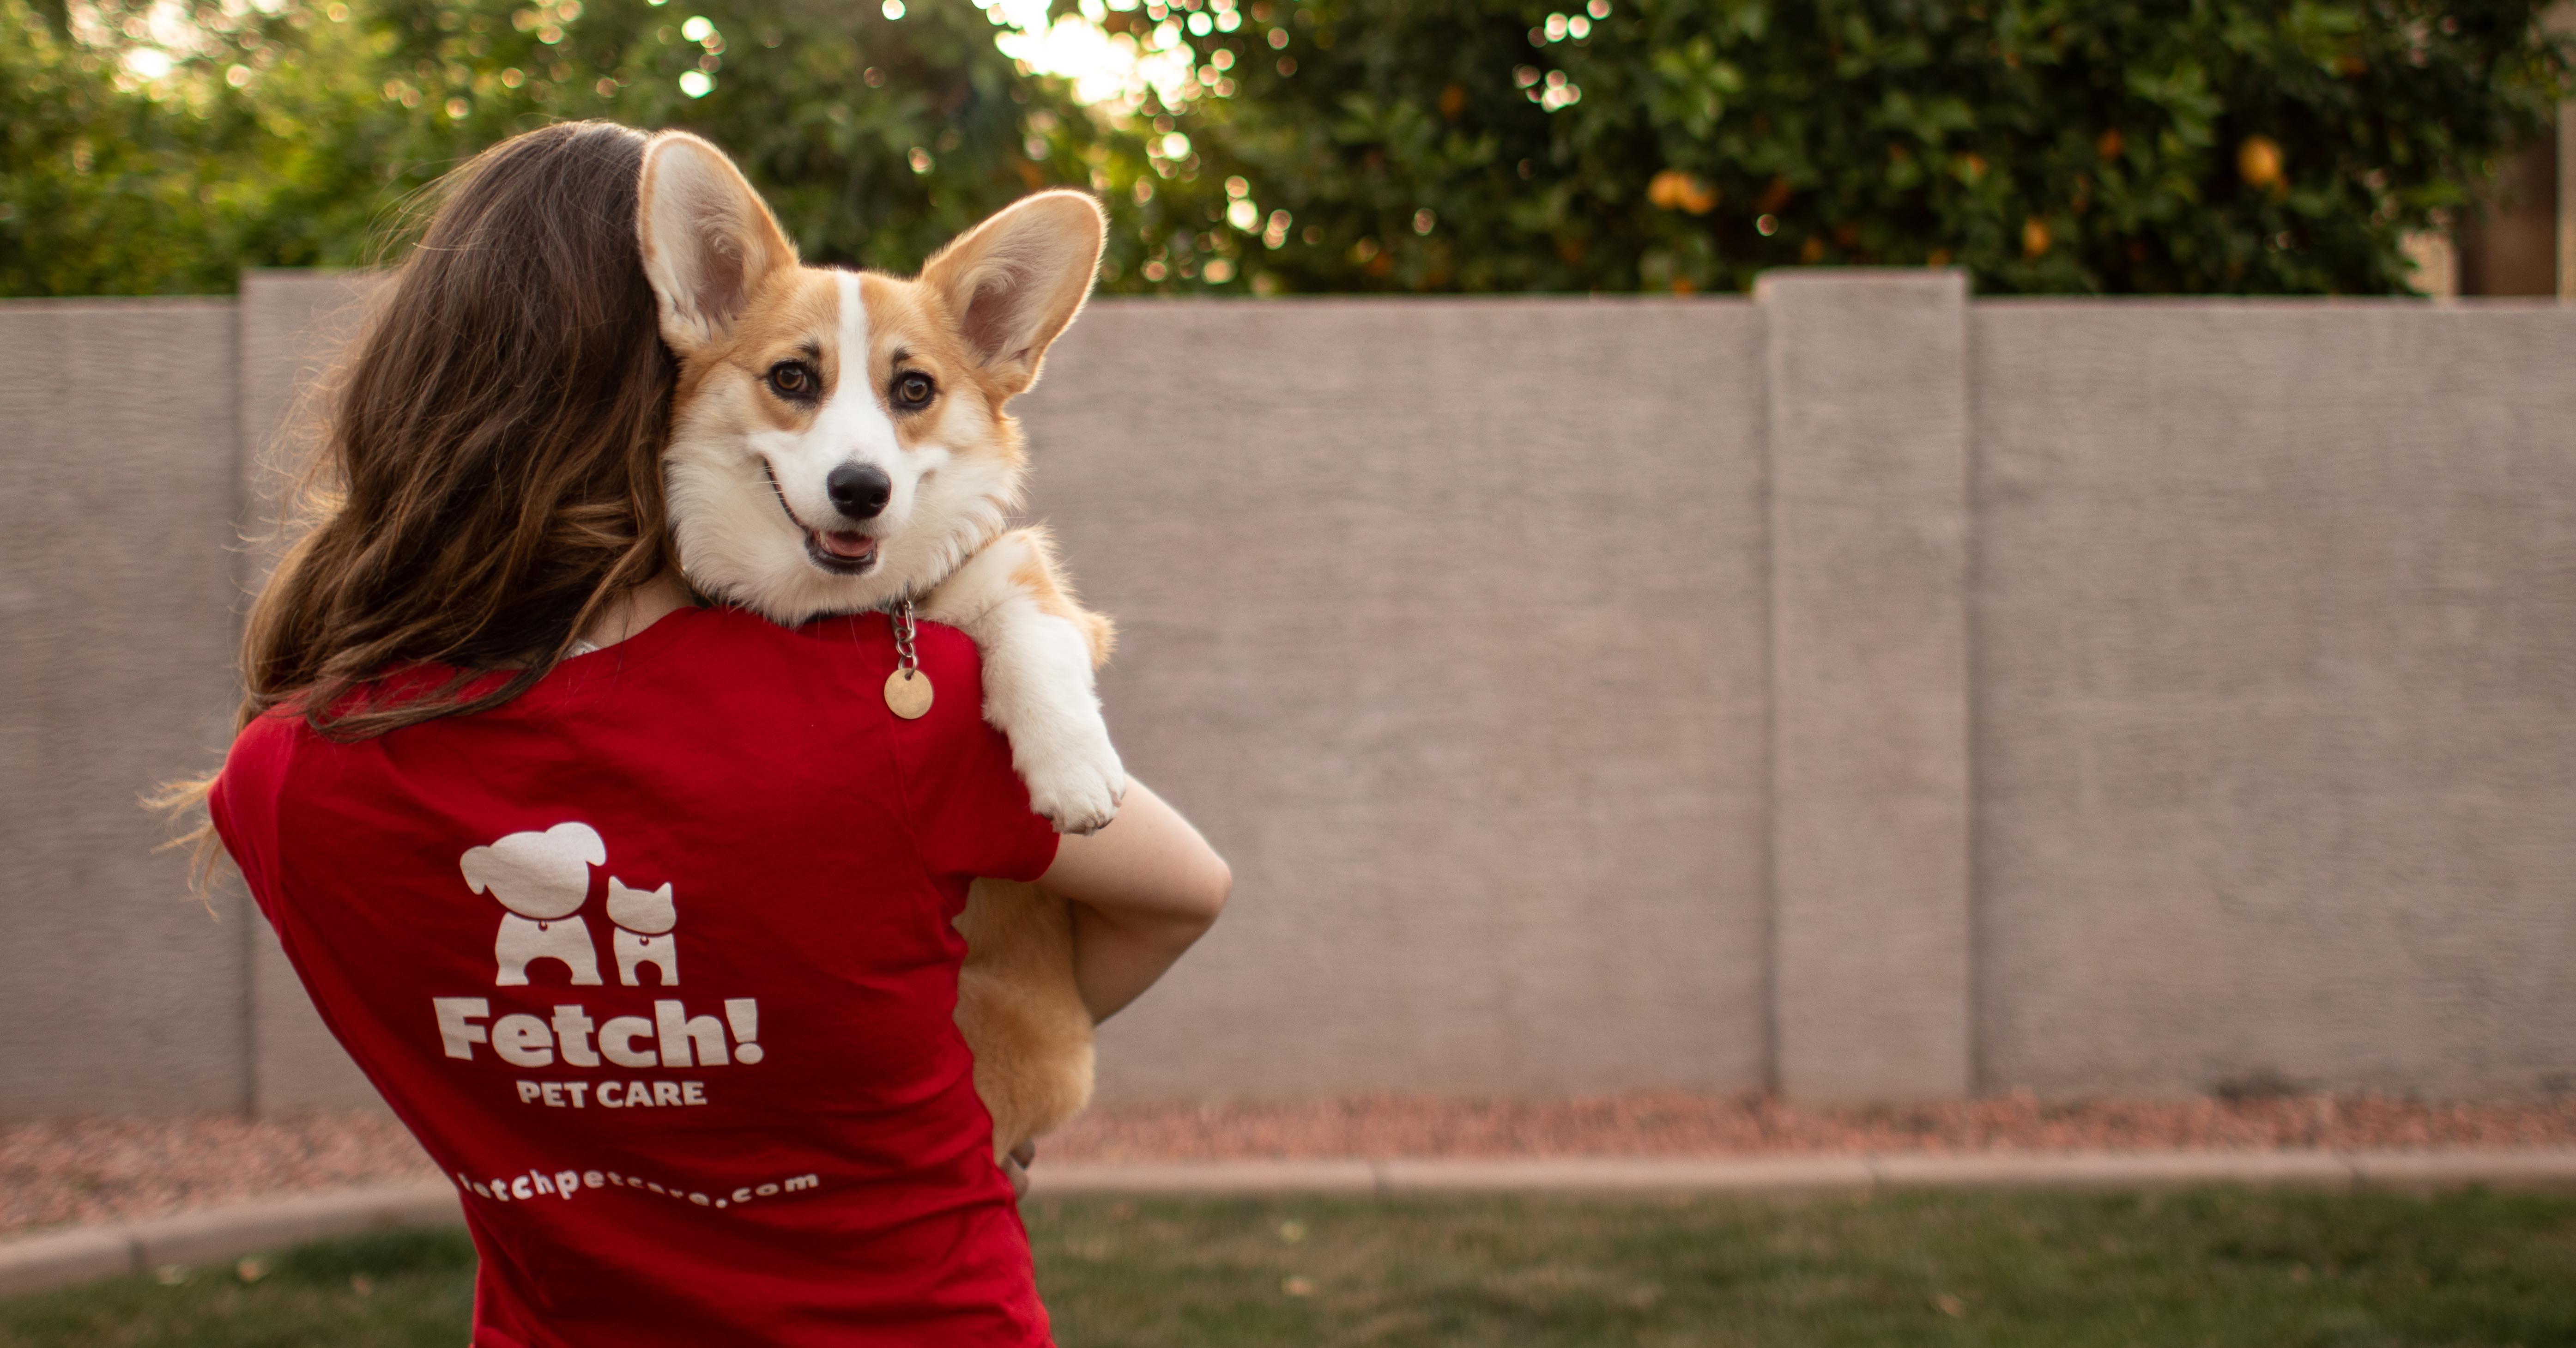 Fetch! Pet Care Dog Walking, Pet Sitting, Cat Visits, Boarding